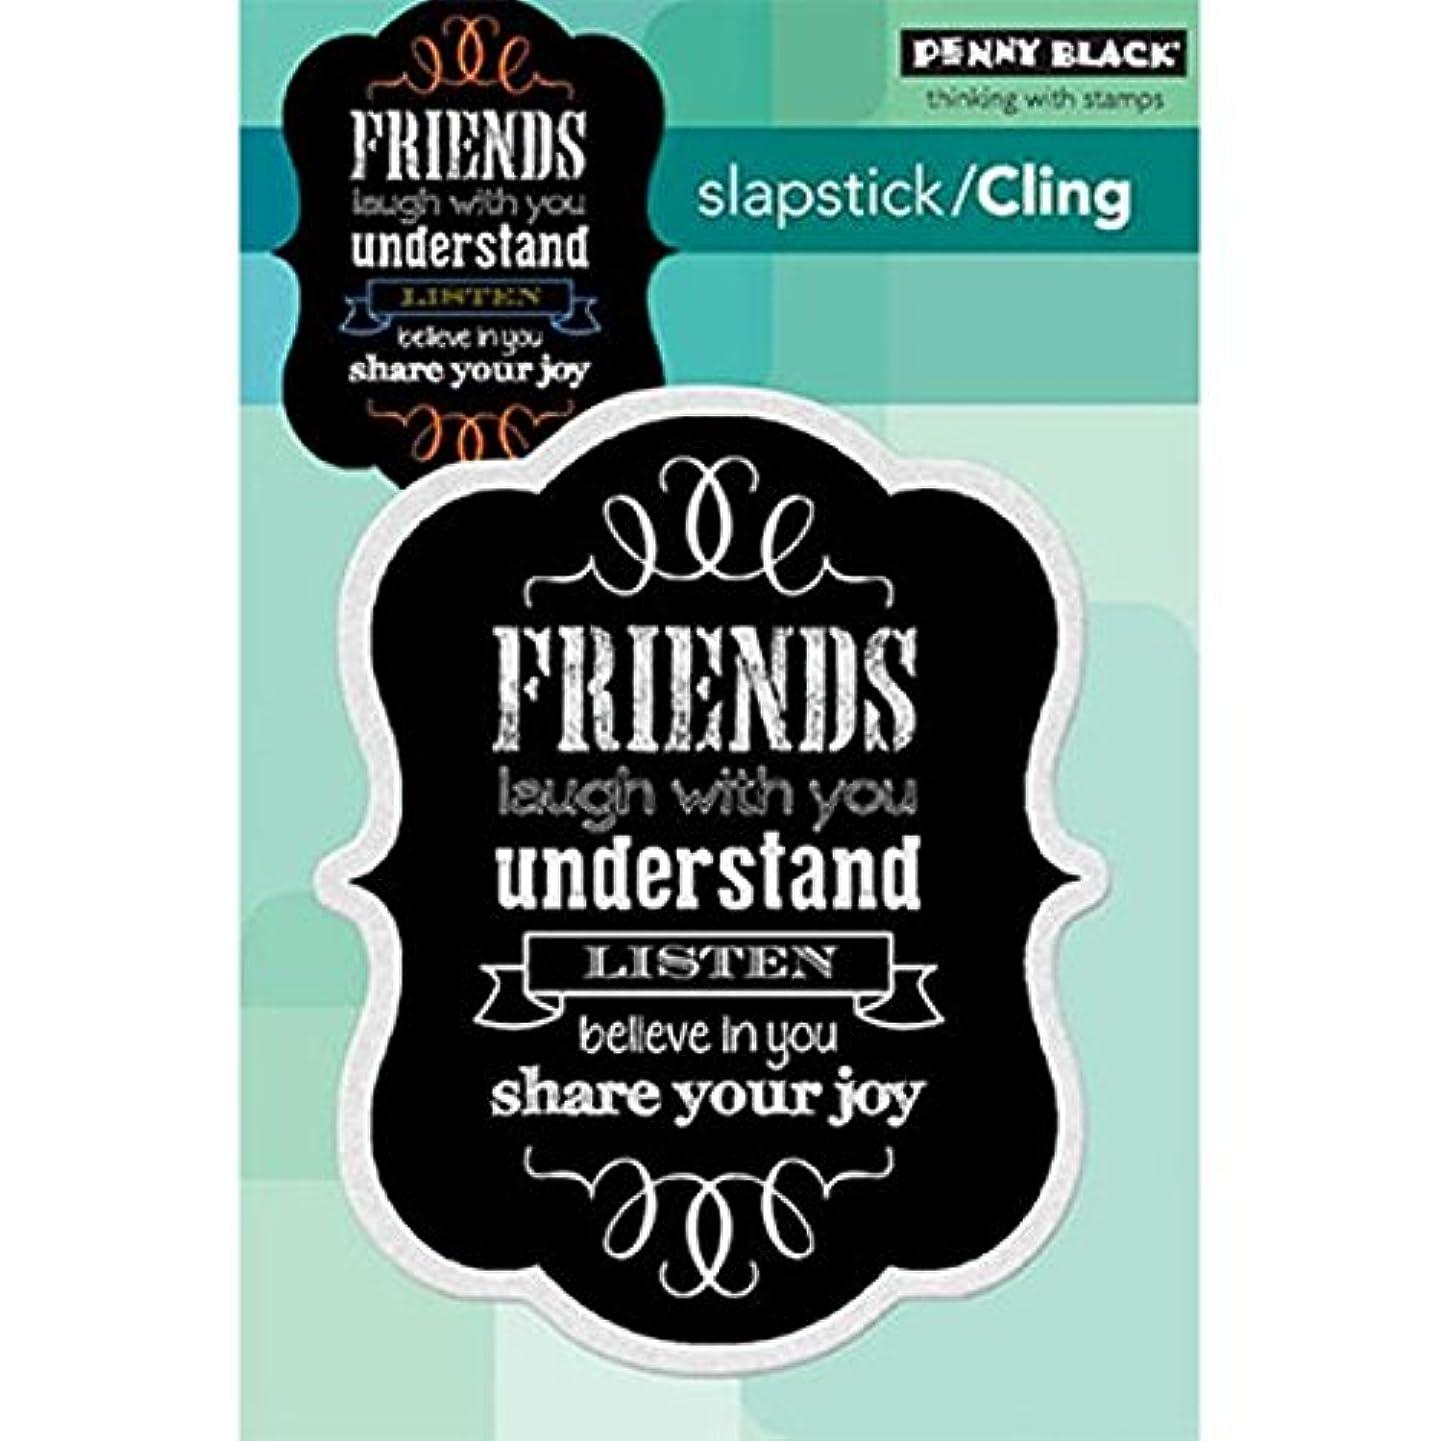 Penny Black Chalkboard Friendship Decorative Stamp